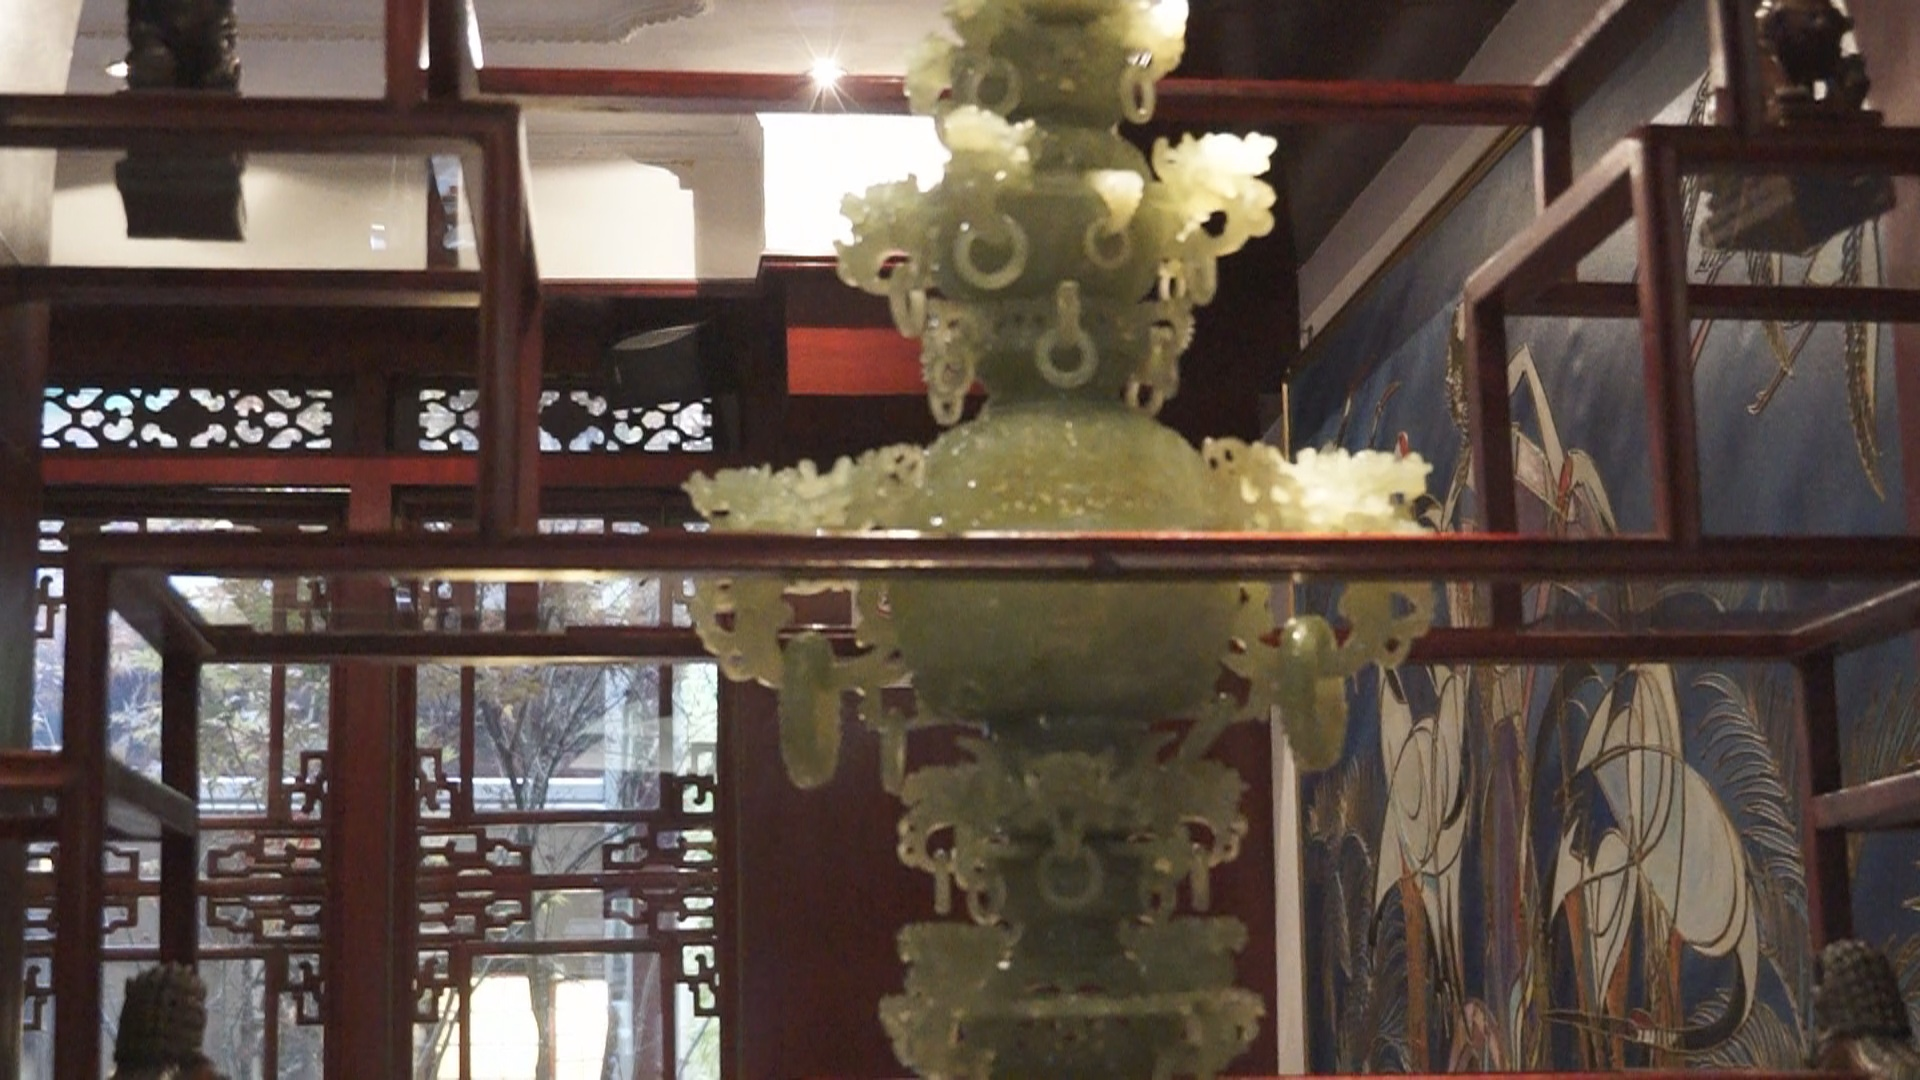 Ristorante osir dove mangiare cucina cinese a firenze for Mangiare cinese